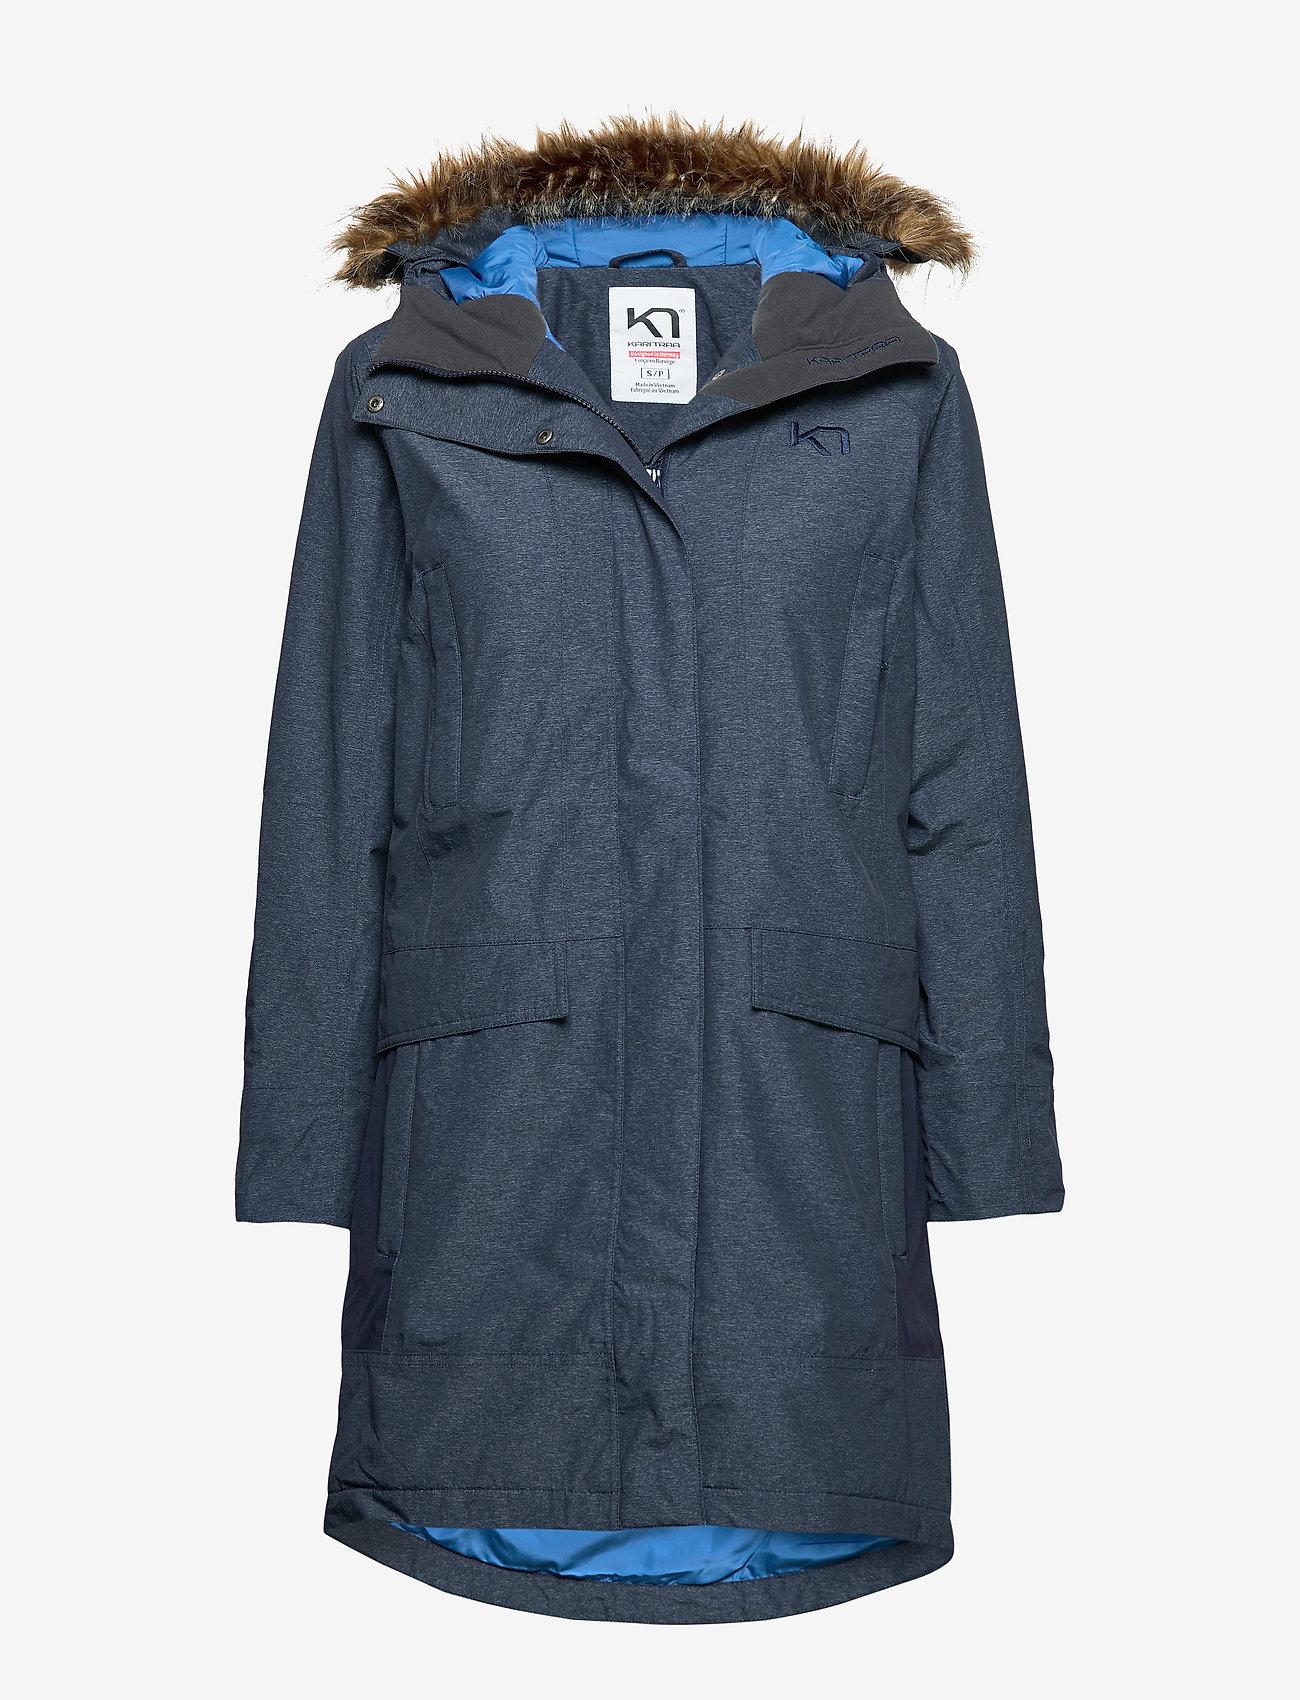 Kari Traa - HELLAND PARKA - parka coats - naval - 0